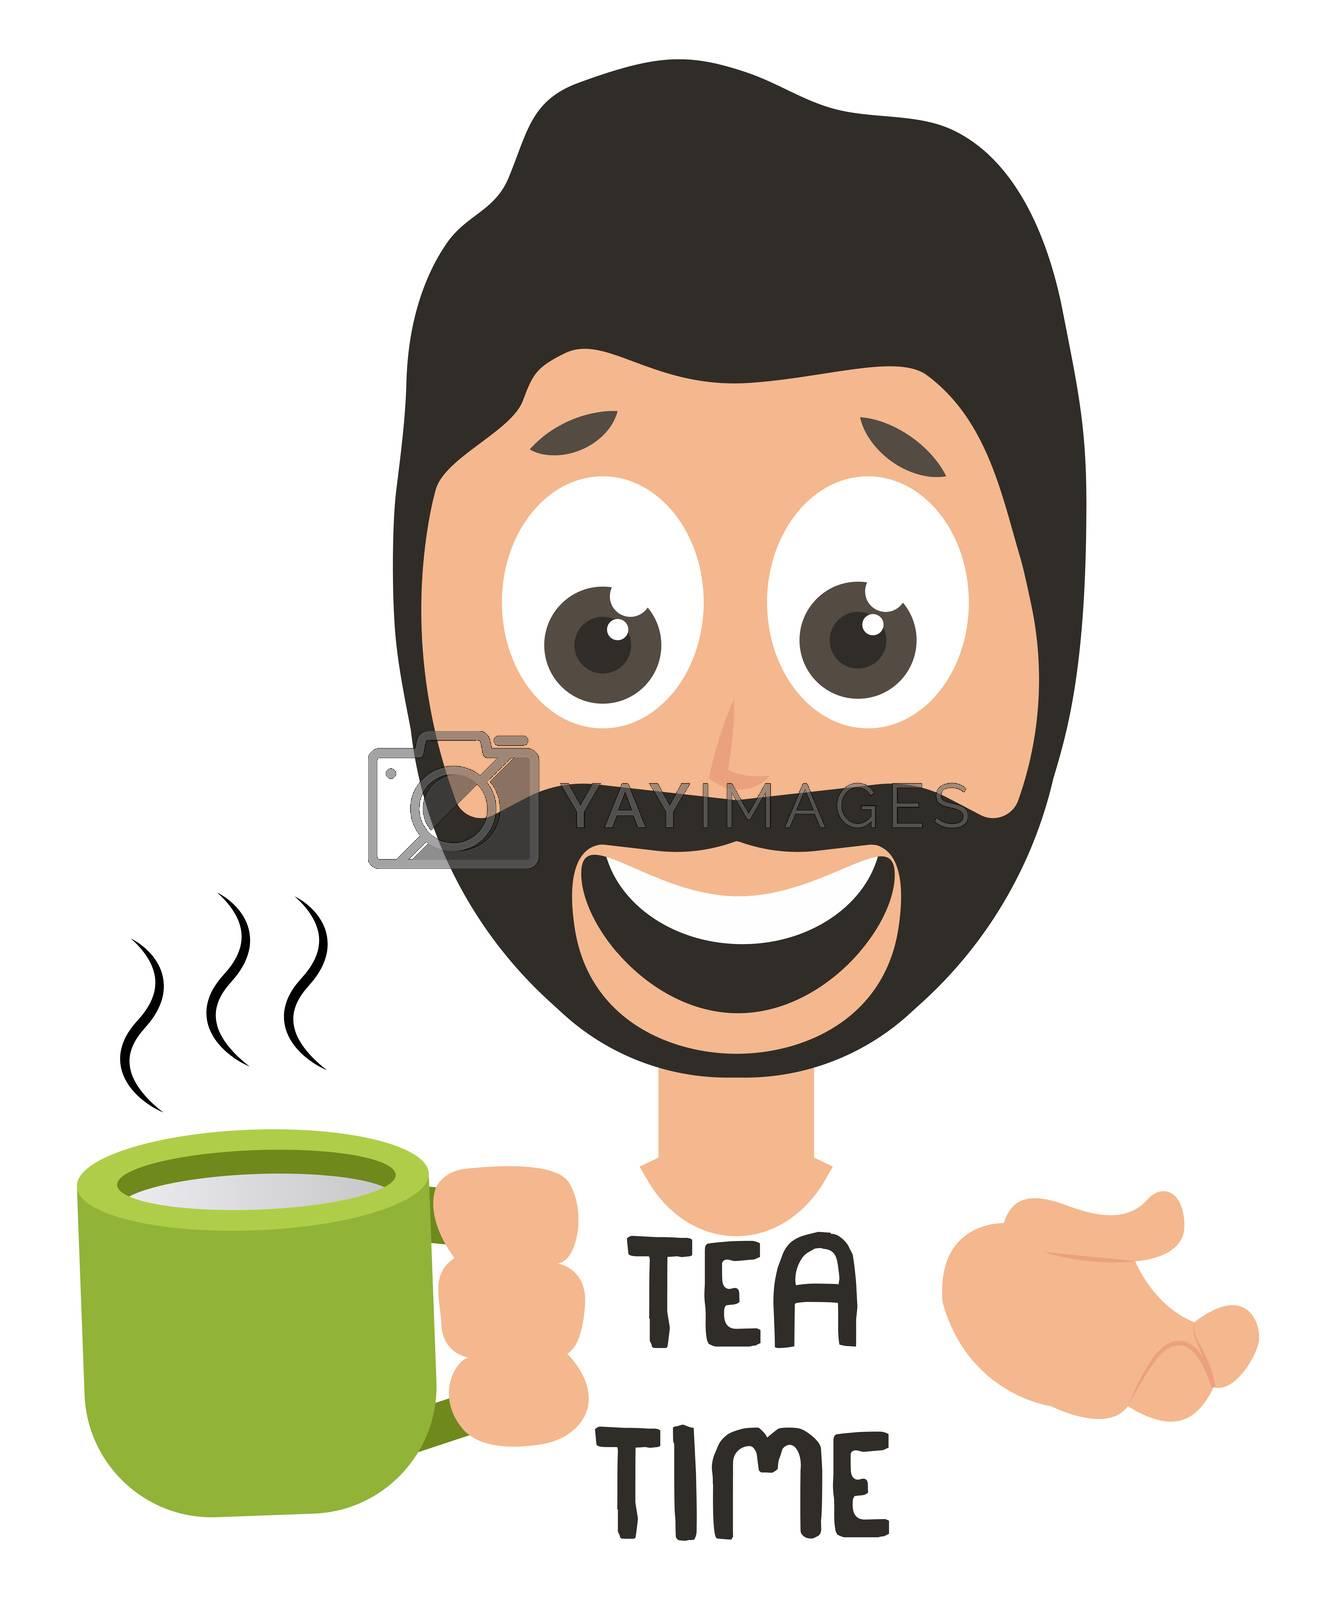 Man drinking tea, illustration, vector on white background